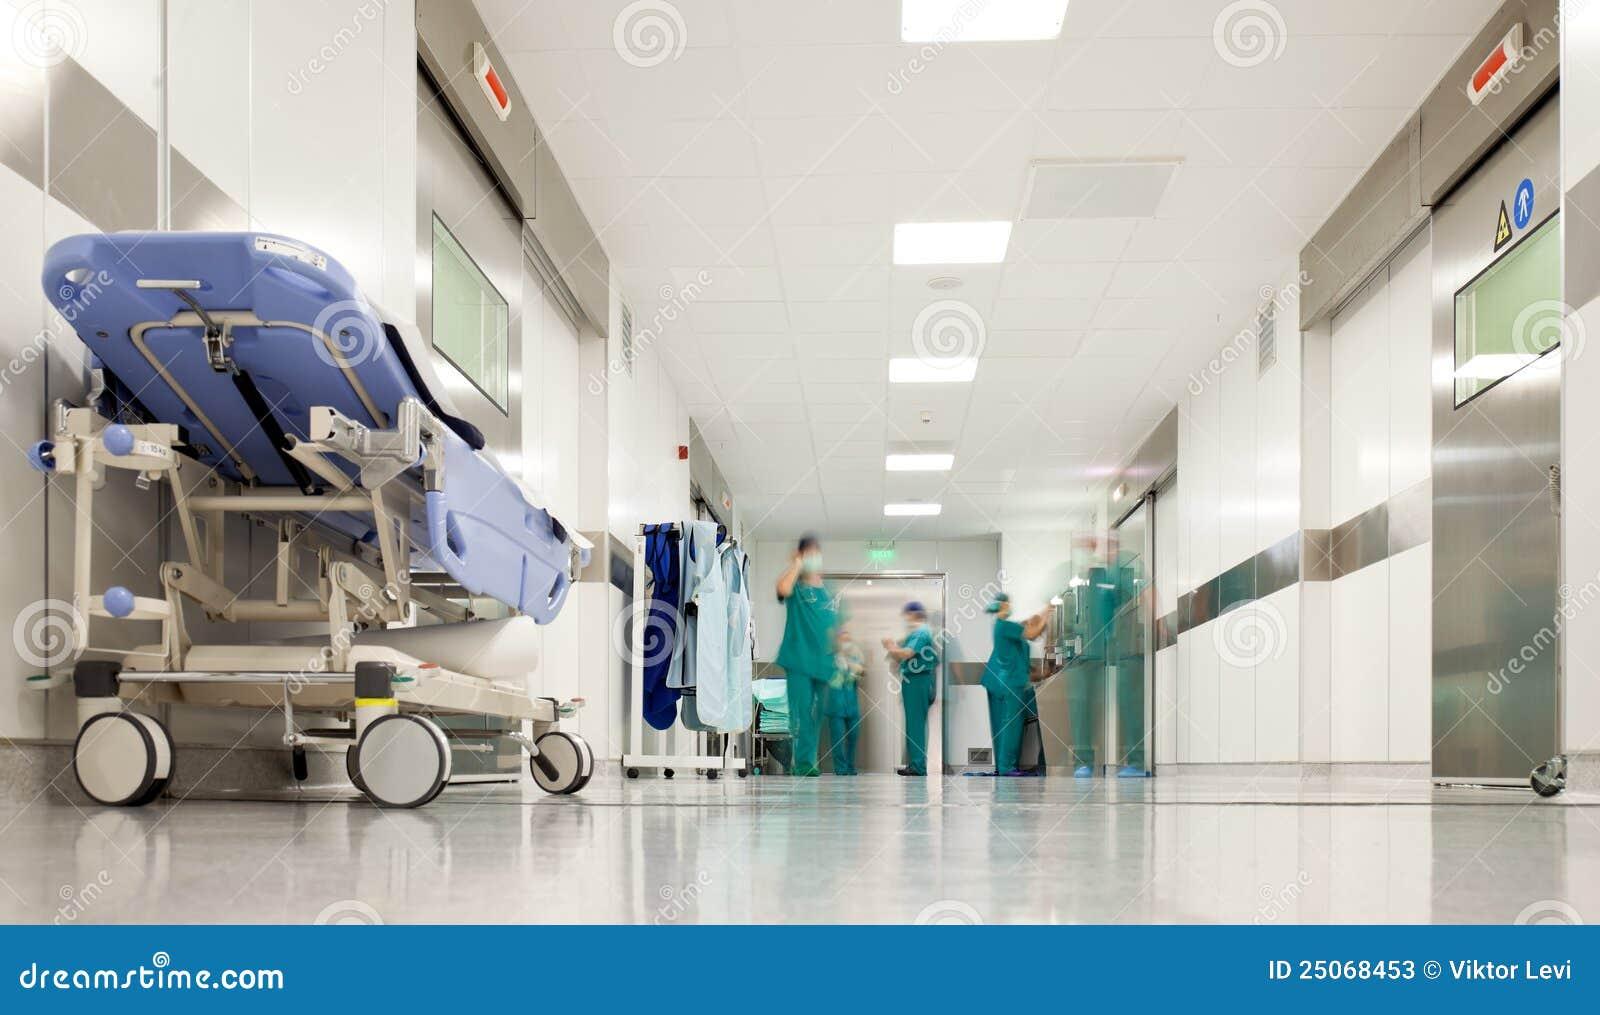 Hospital surgery corridor